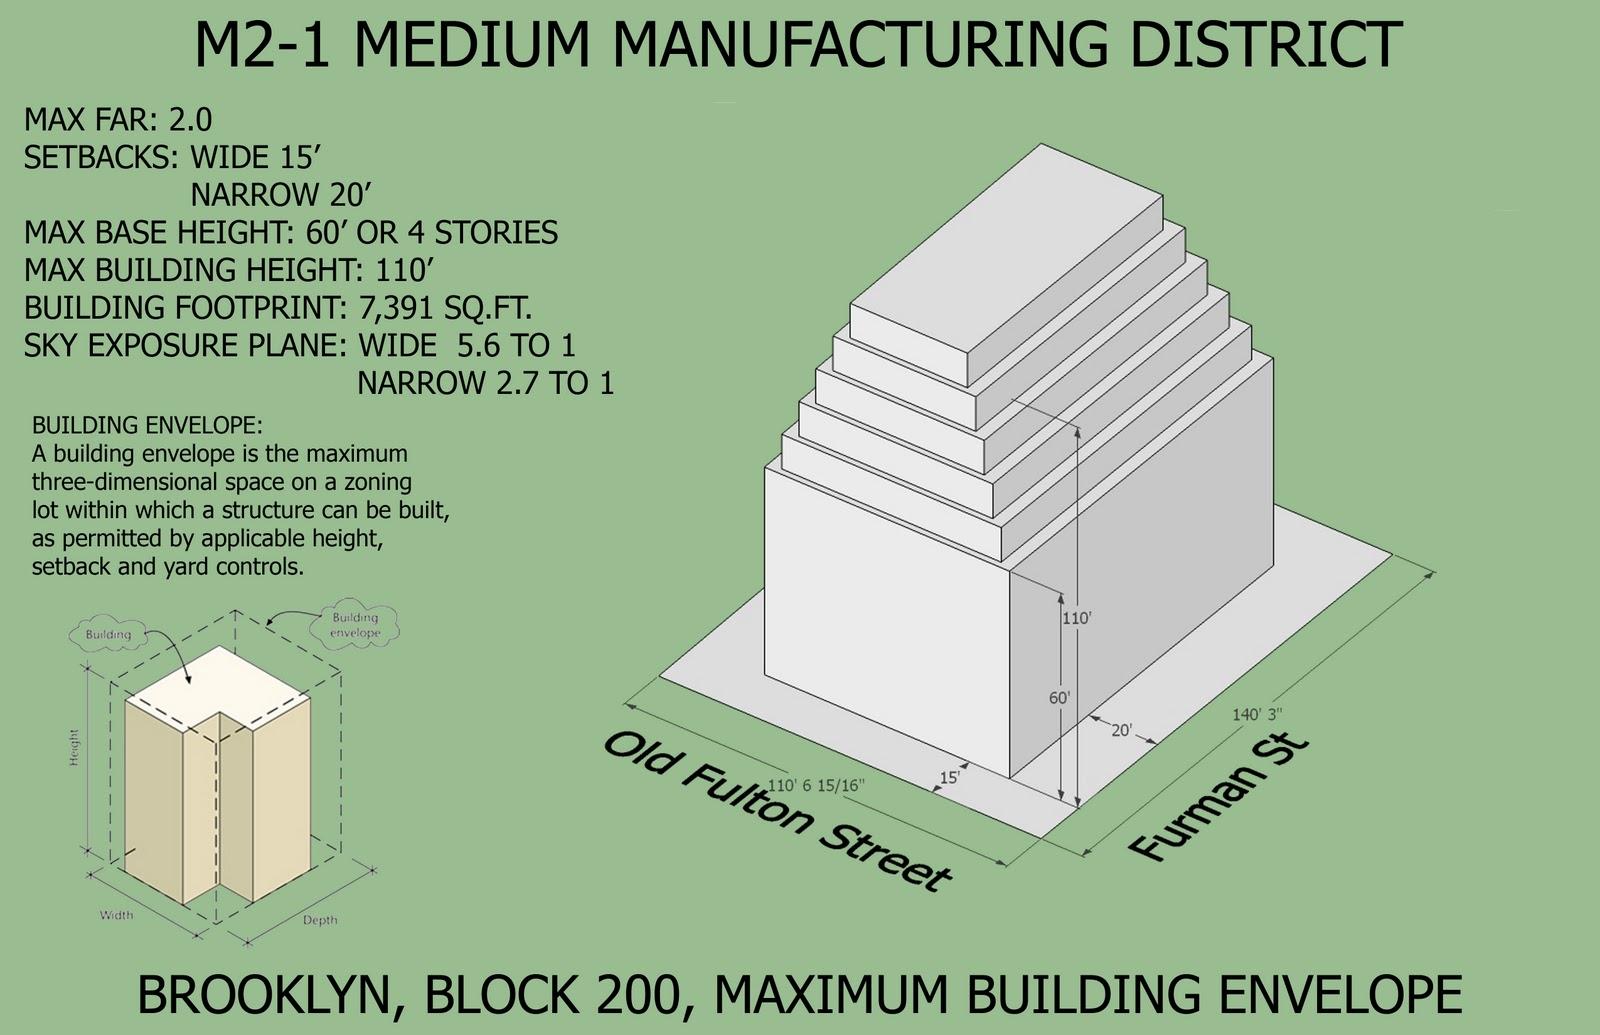 Arch 3611 Fall11 Mdargenio Maximum Building Envelope